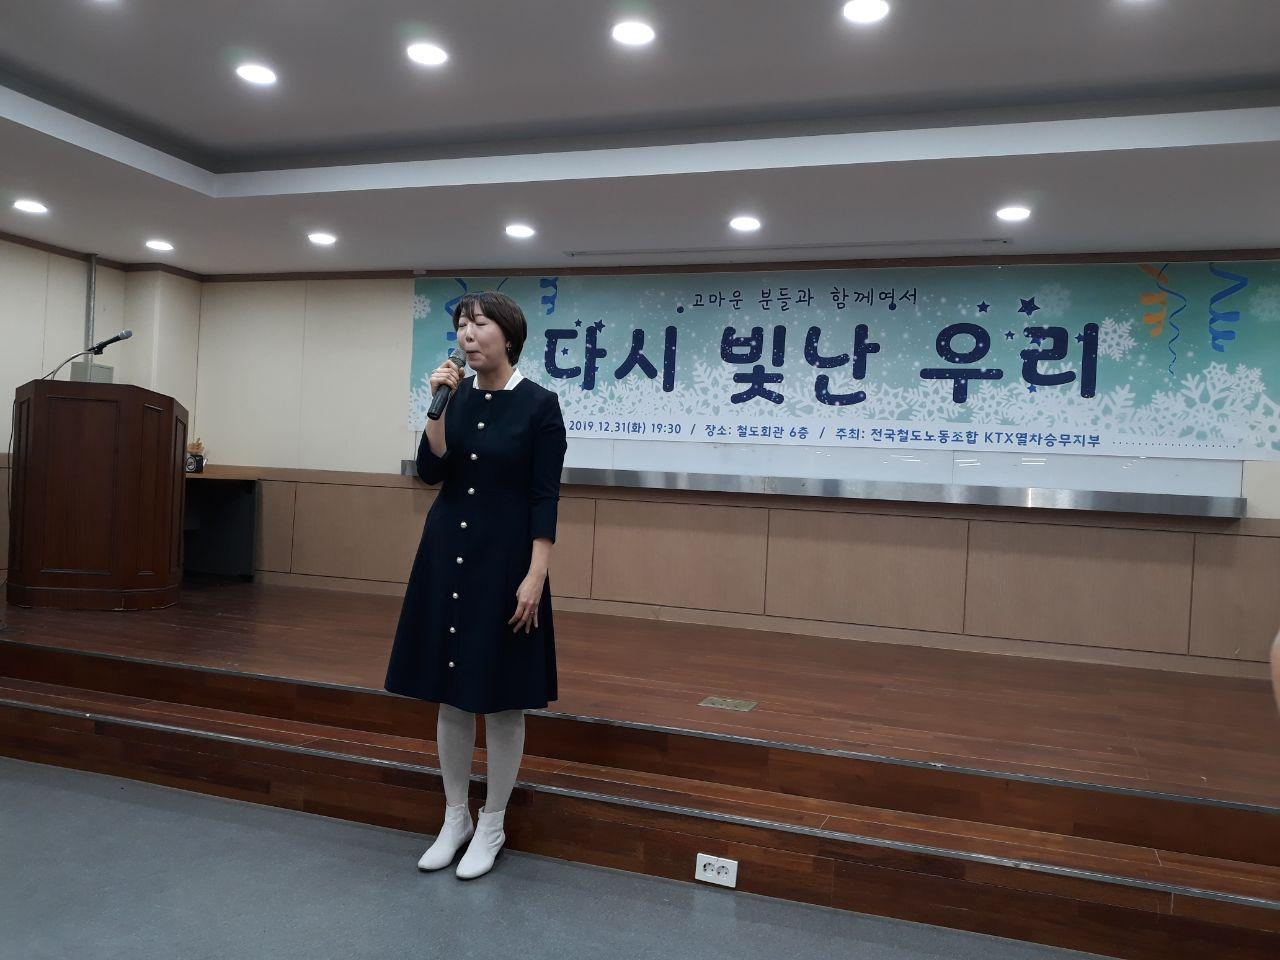 1 2019.12.31. KTX승무원과 함께하는 송년회 [출처 철폐연대].jpg